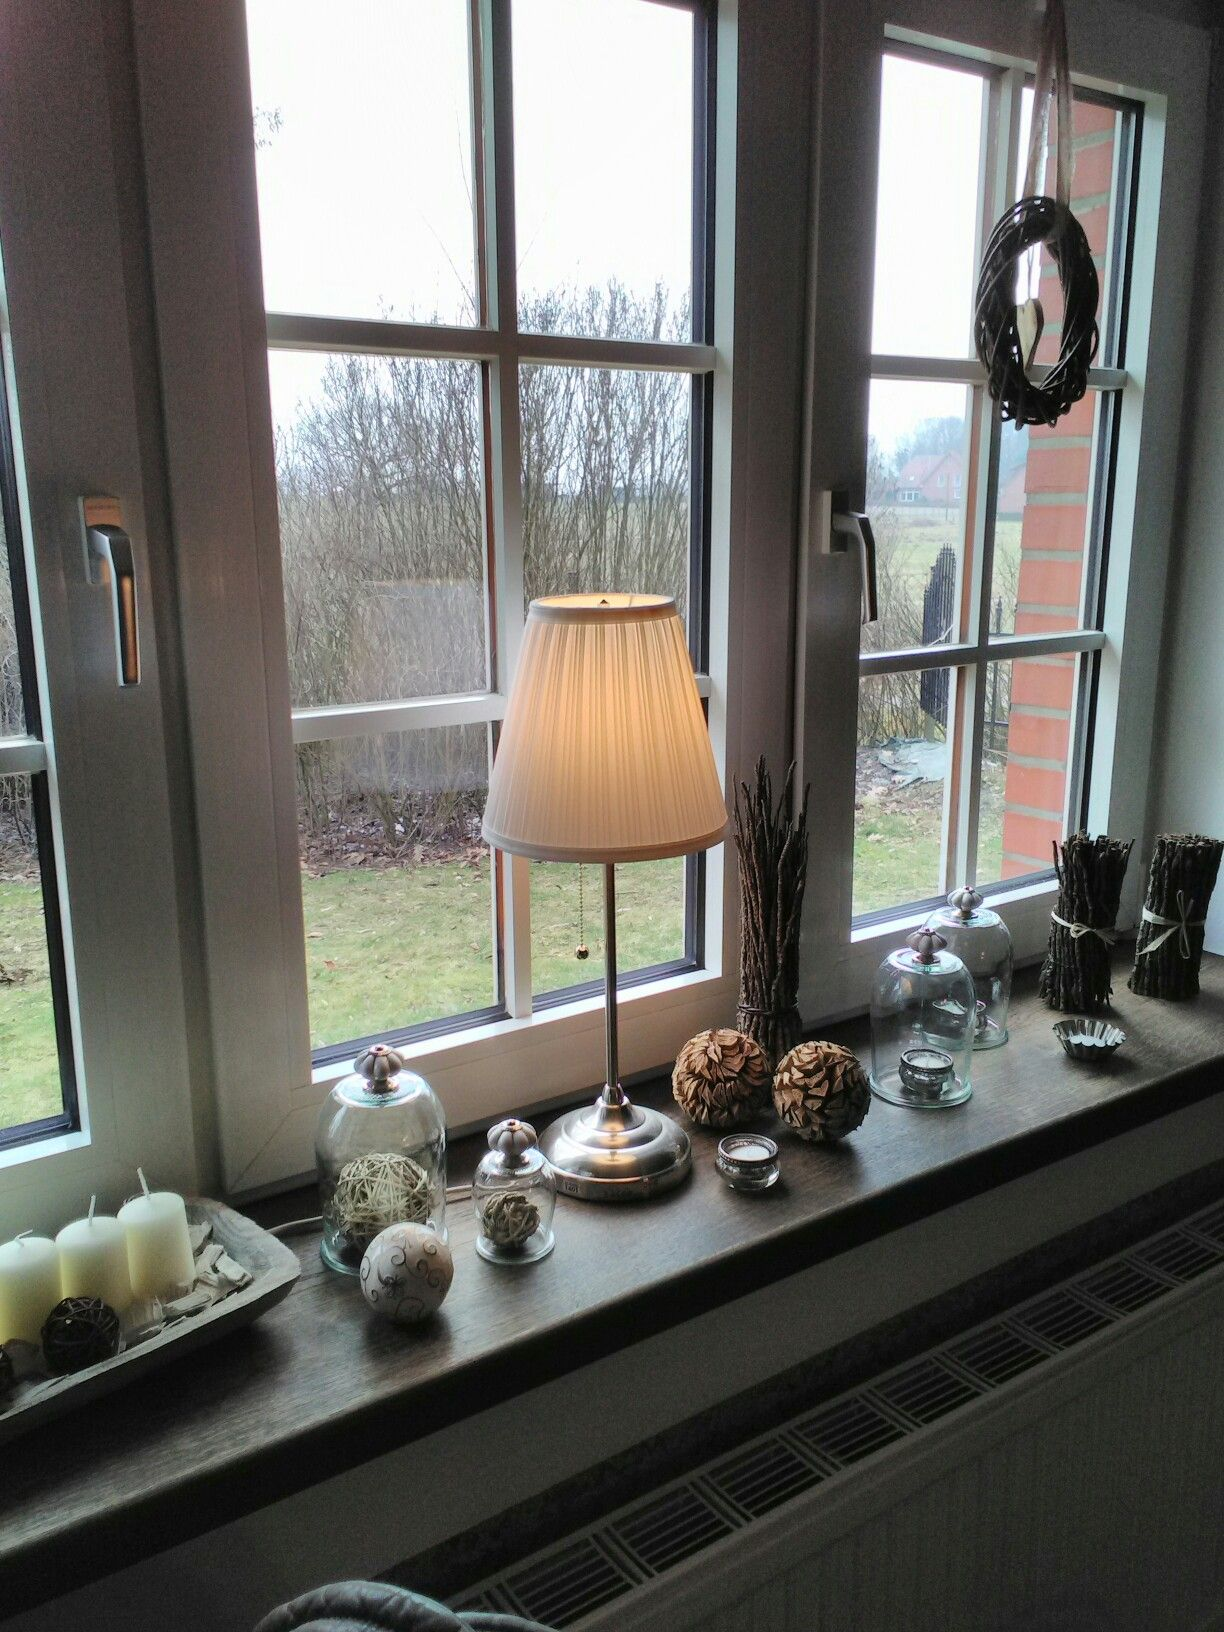 fensterbank fenster dekorieren. Black Bedroom Furniture Sets. Home Design Ideas